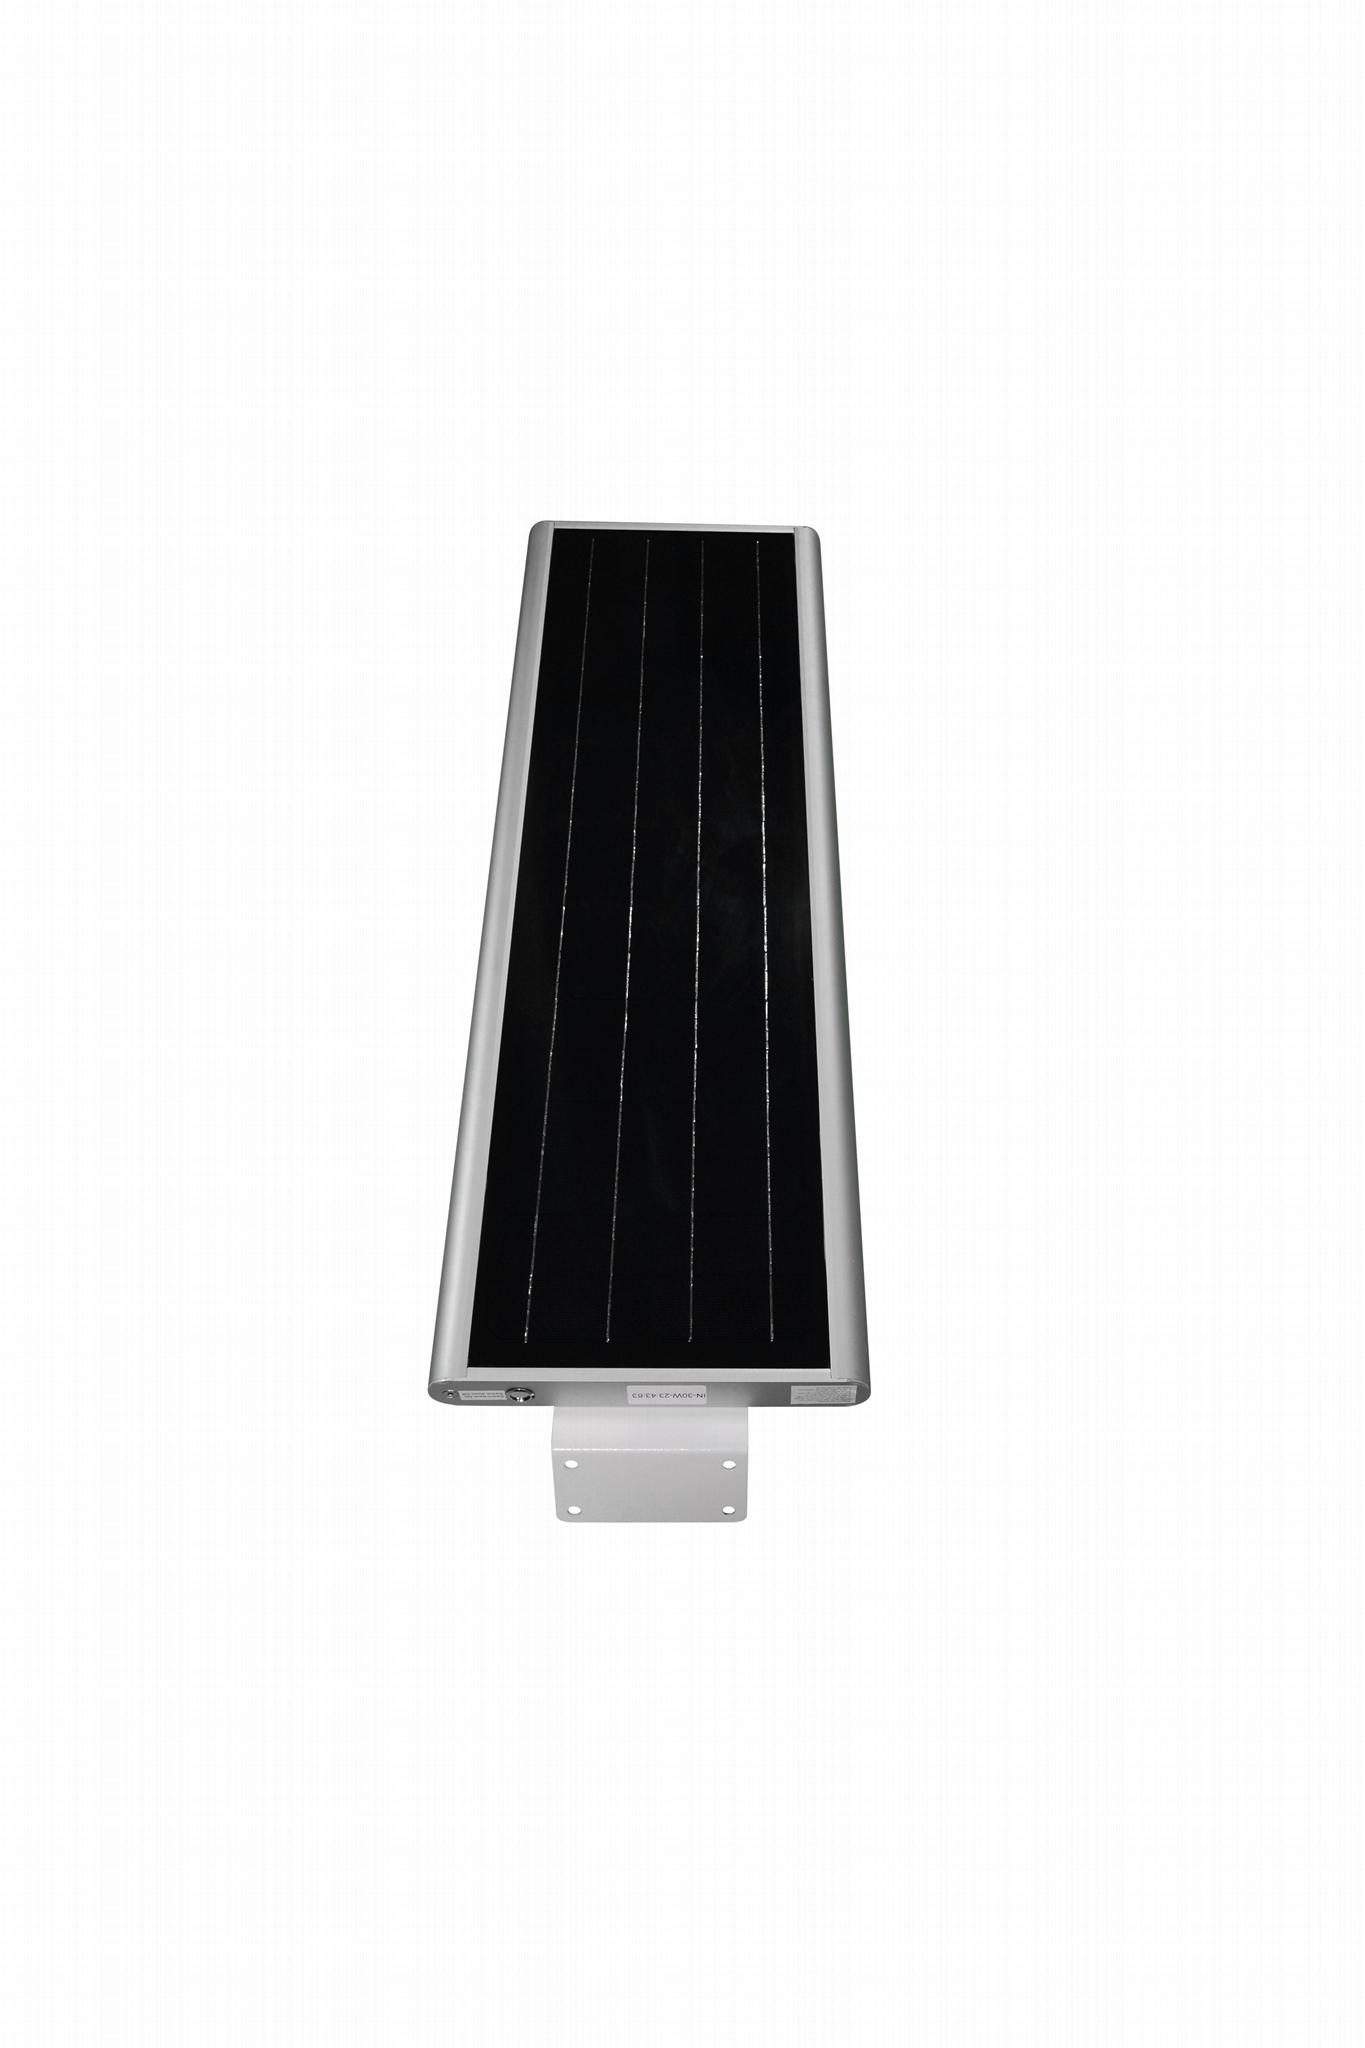 LOWCLED IP65 30Watt all in one integrated solar led street light, garden lamp 3